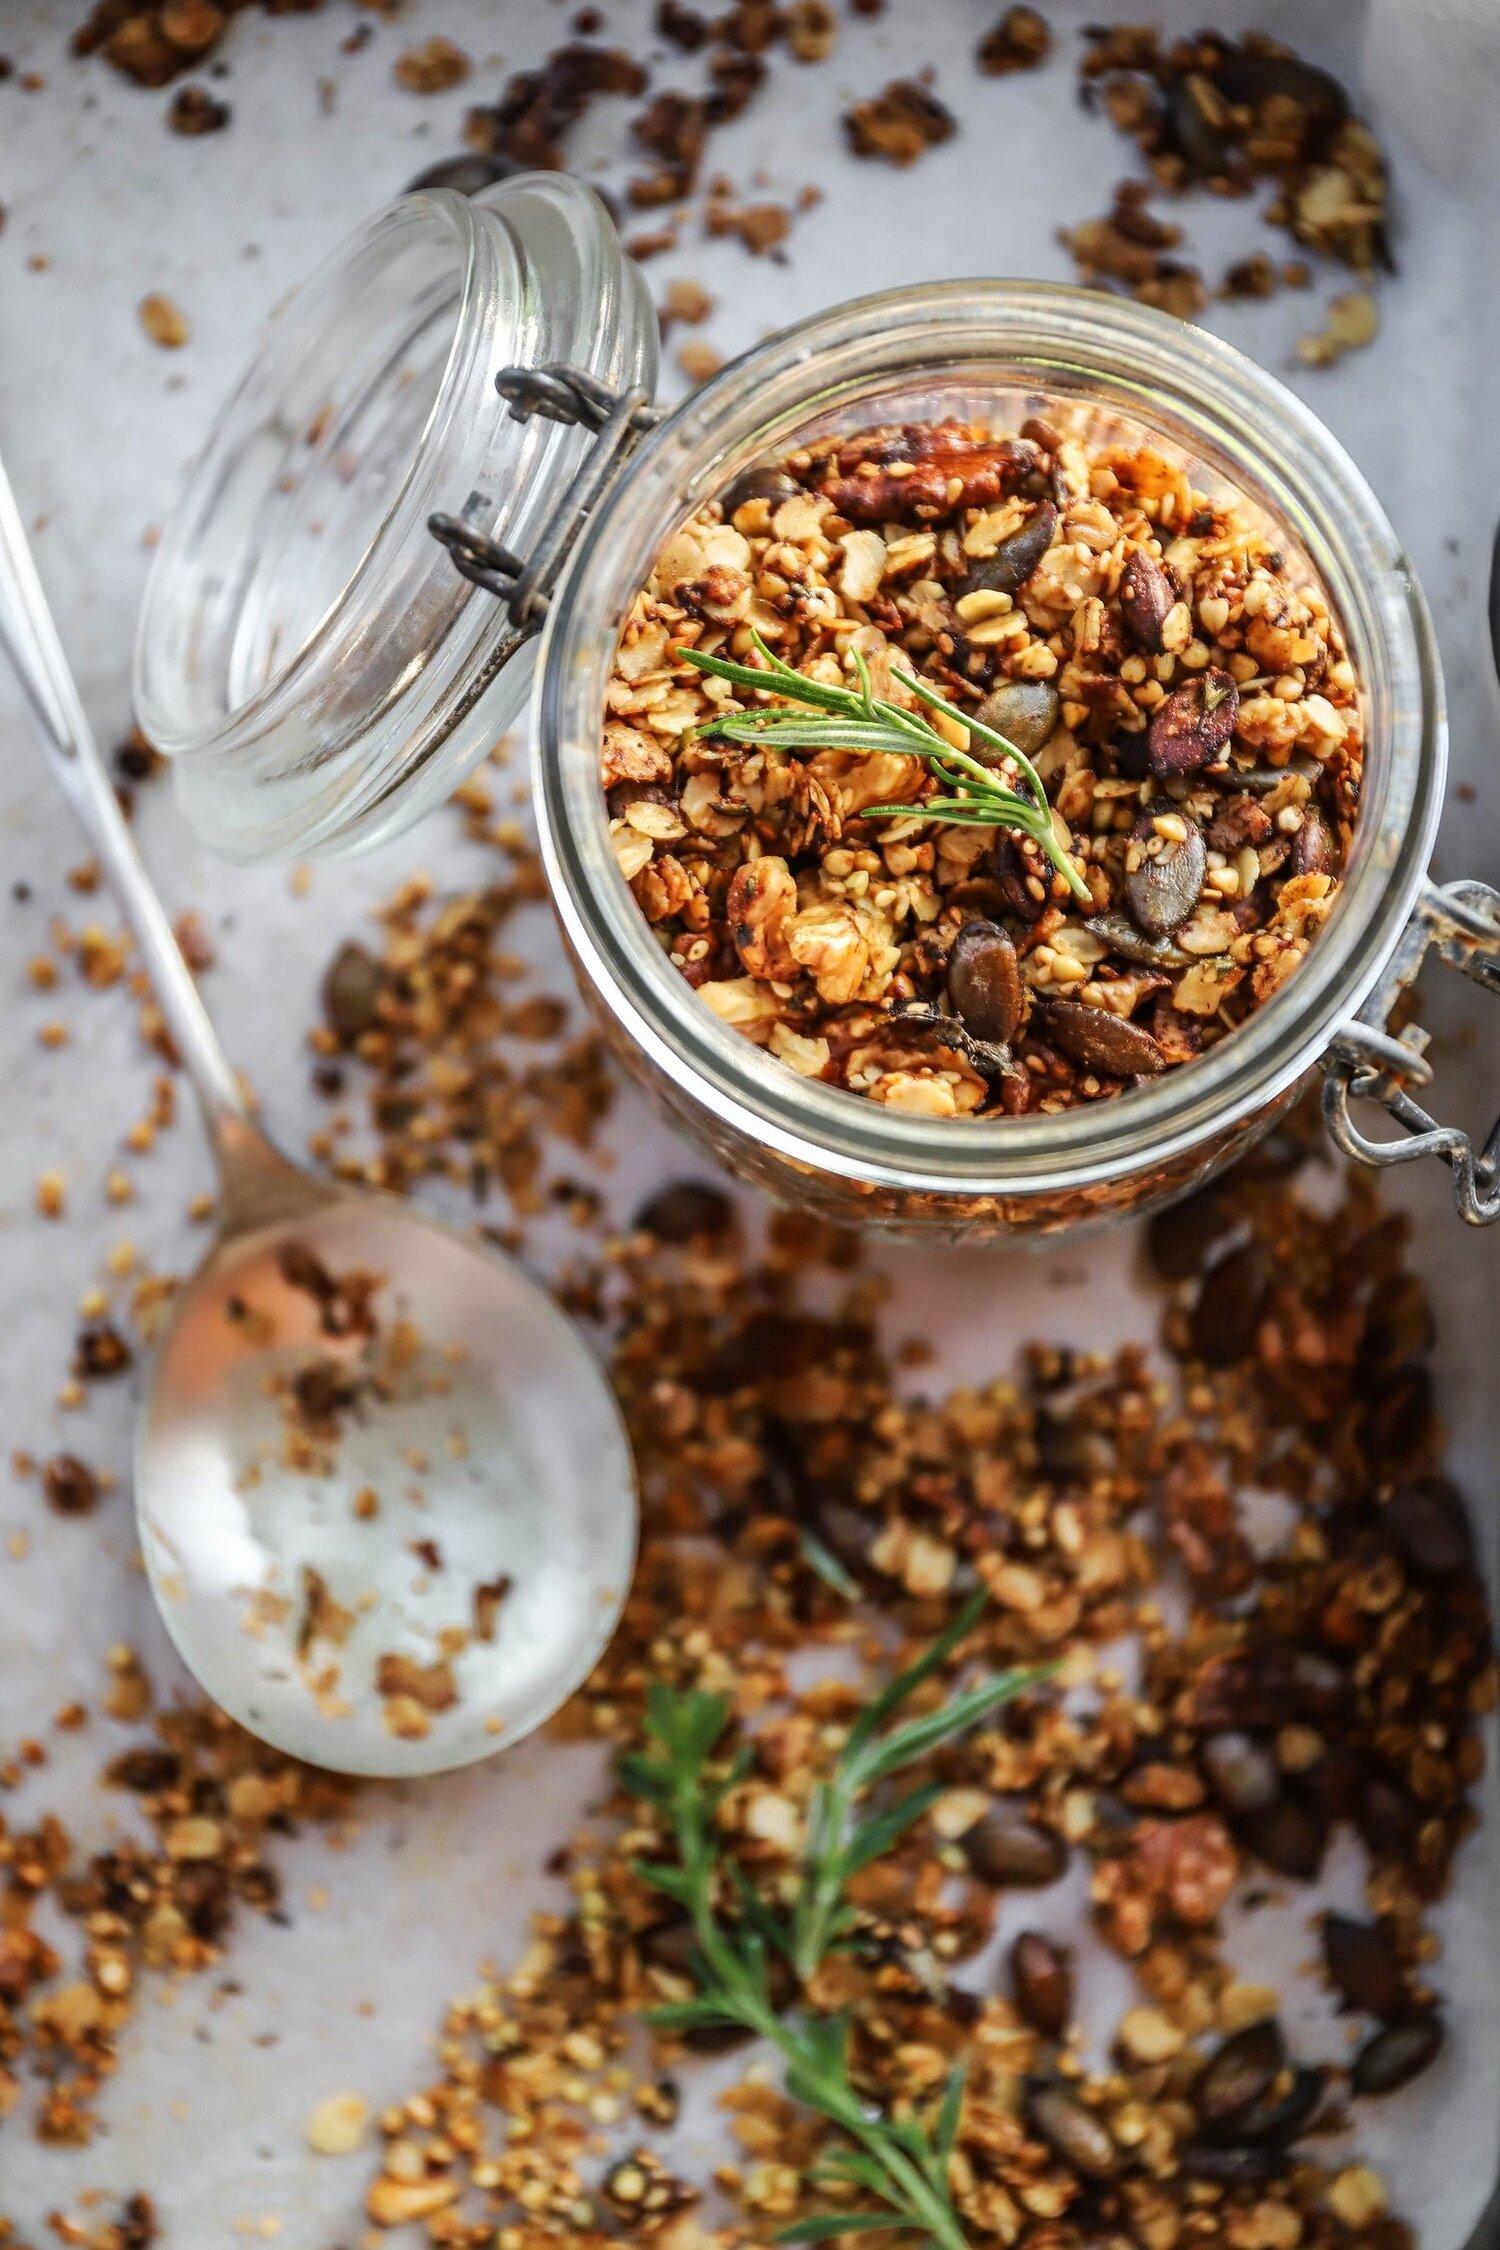 Savoury Granola With Buckwheat Walnuts Rosemary Mustard Judilicious And Nutritious